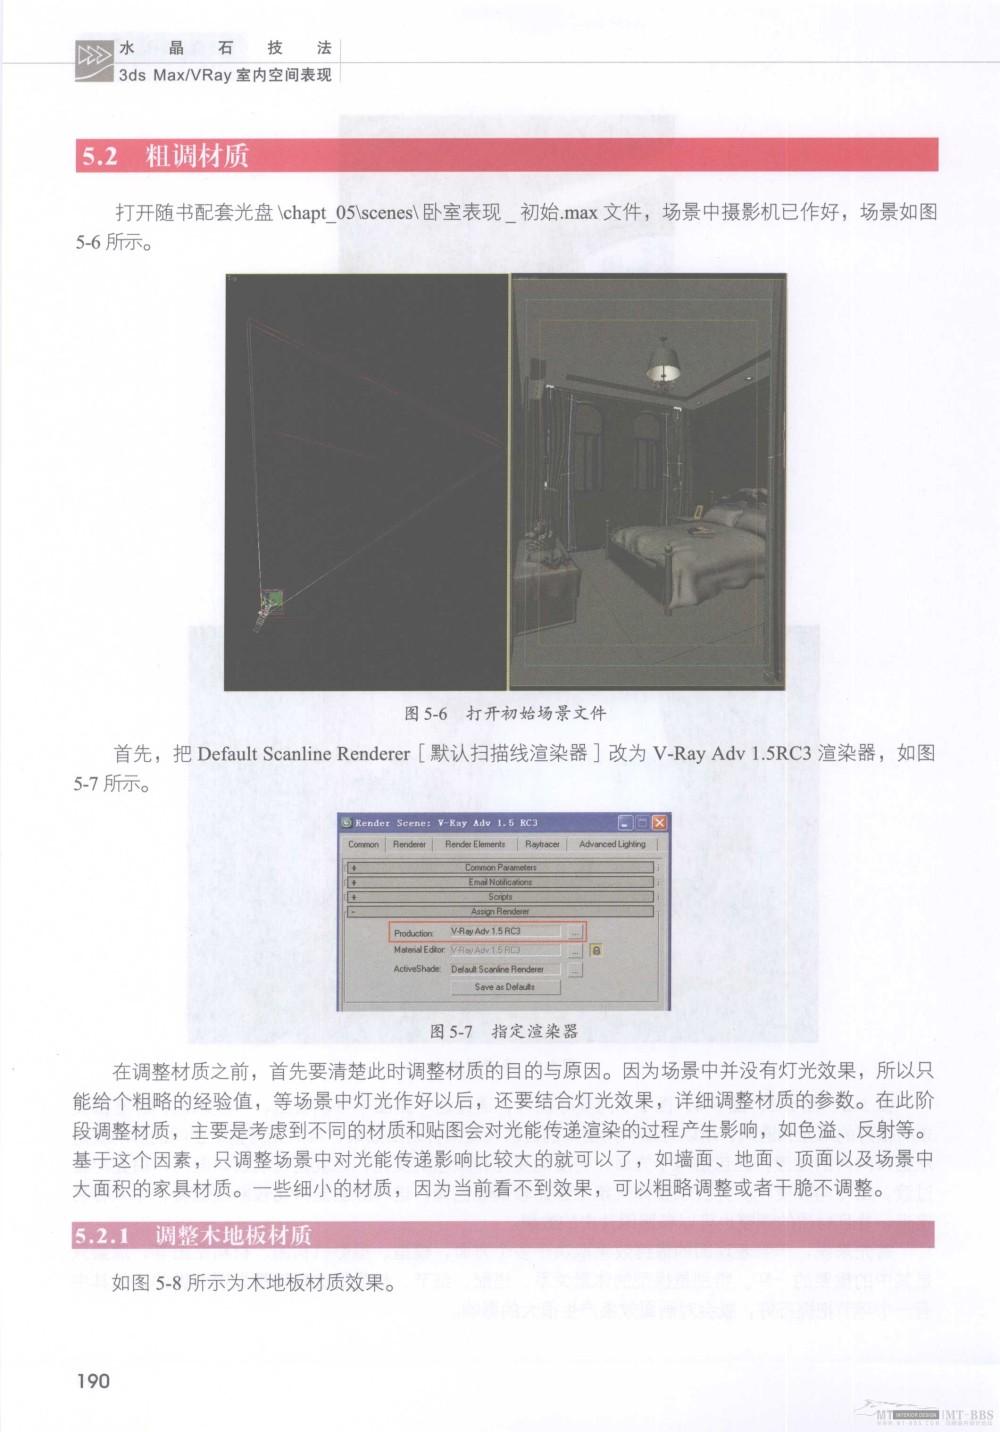 水晶石技法-3ds_Max&VRay室内空间表现_水晶石技法-3ds_Max&VRay室内空间表现_页面_196.jpg